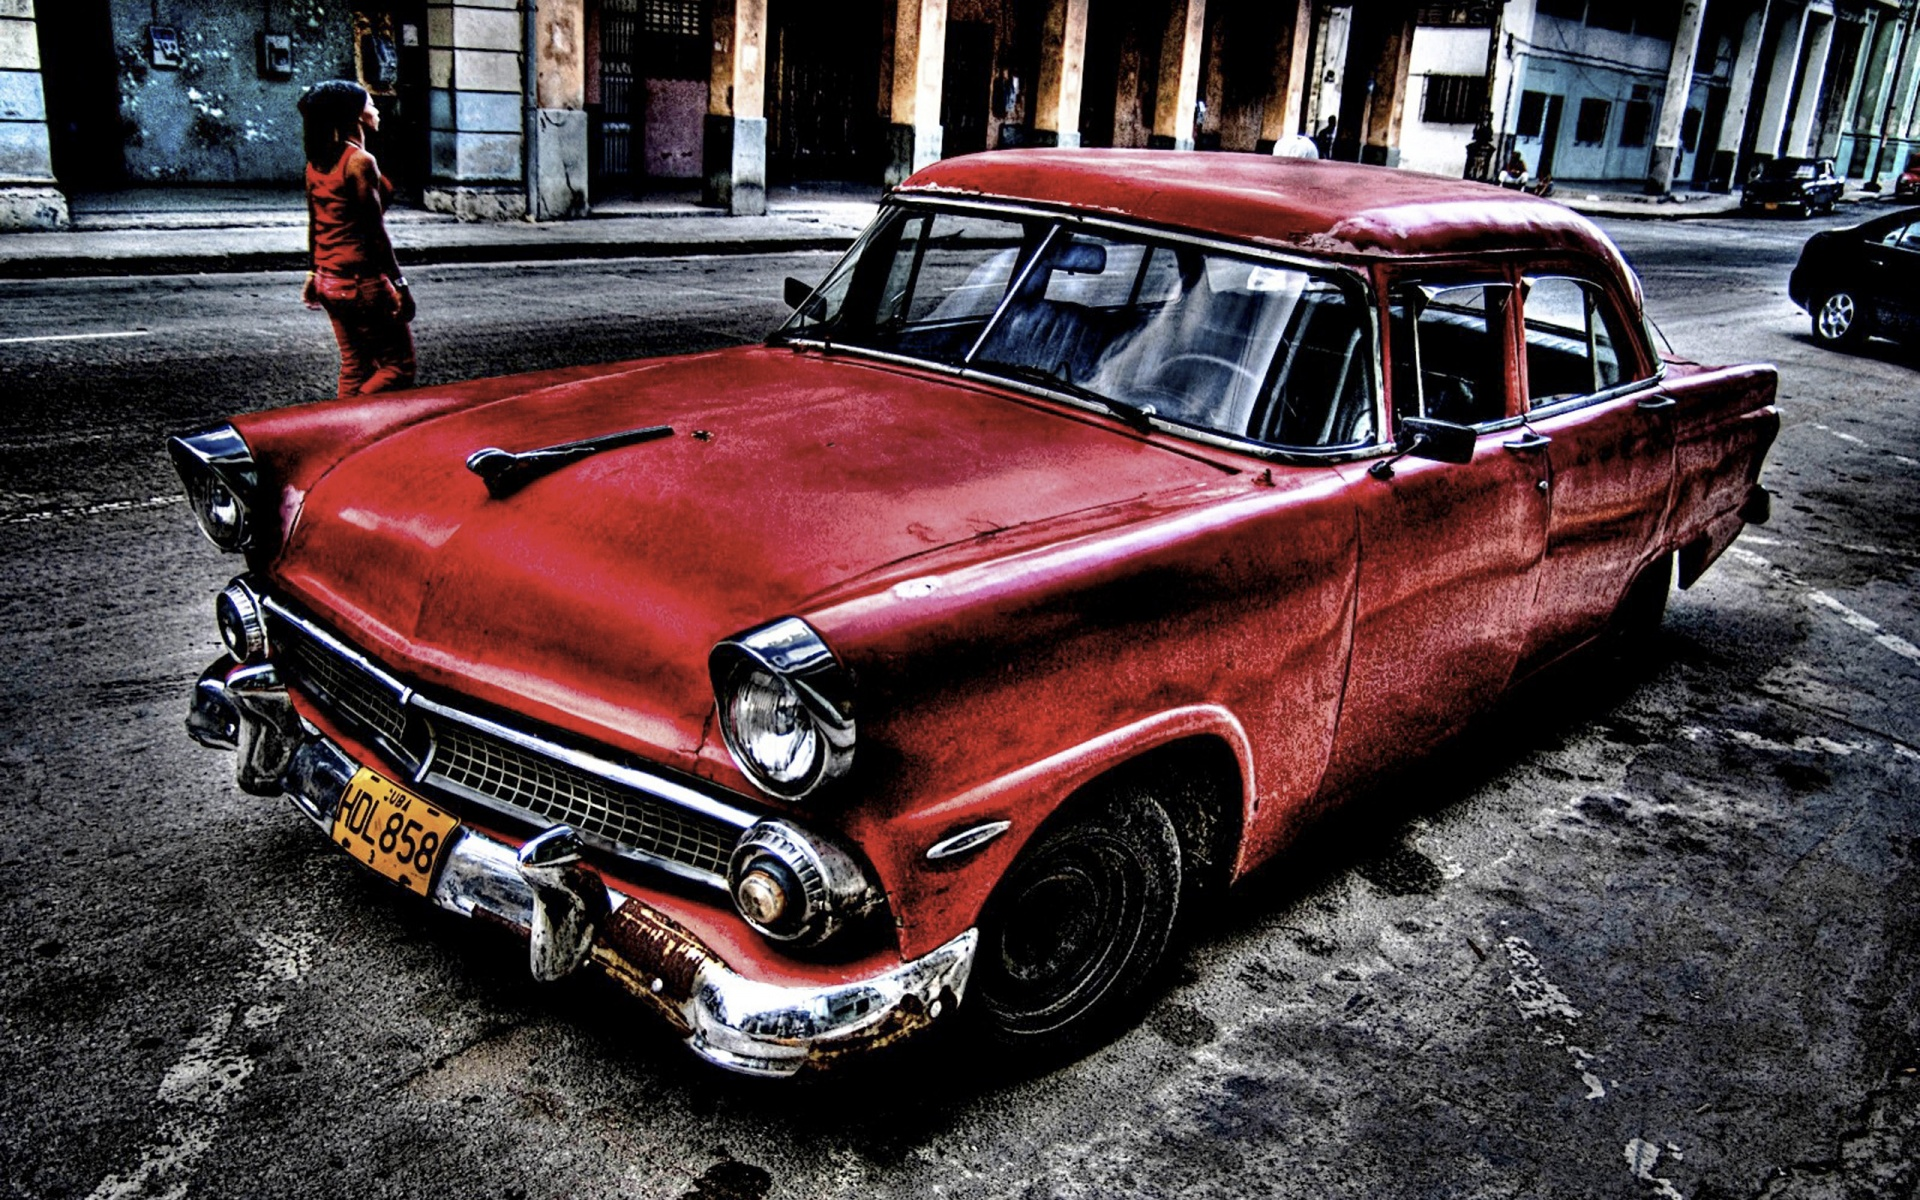 74 Old School Cars Wallpaper On Wallpapersafari